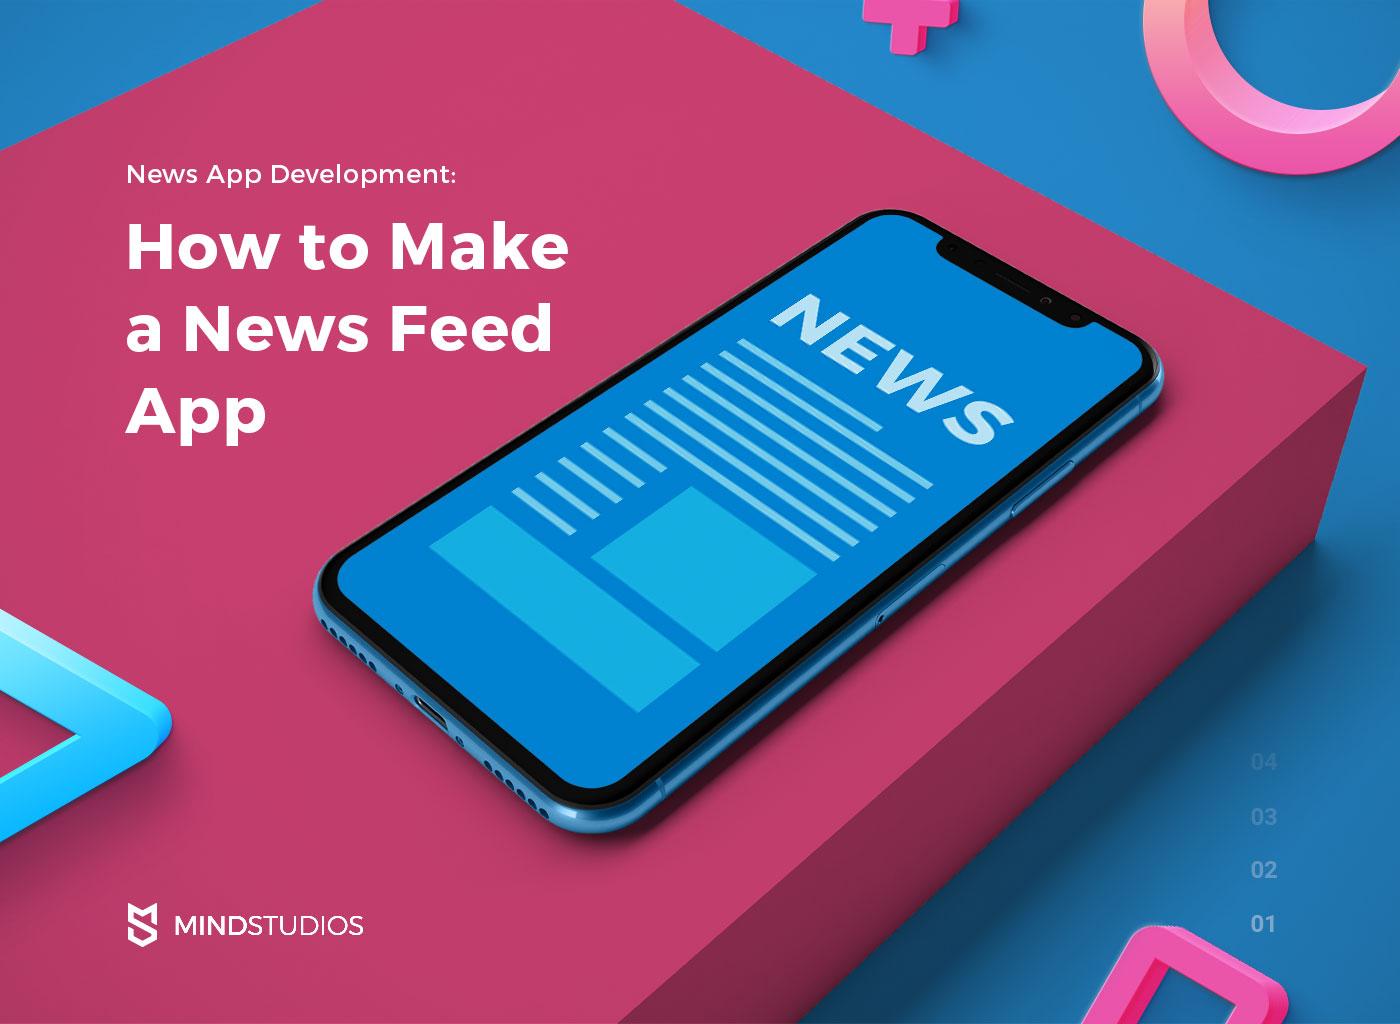 News App Development: How to Make a News Feed App